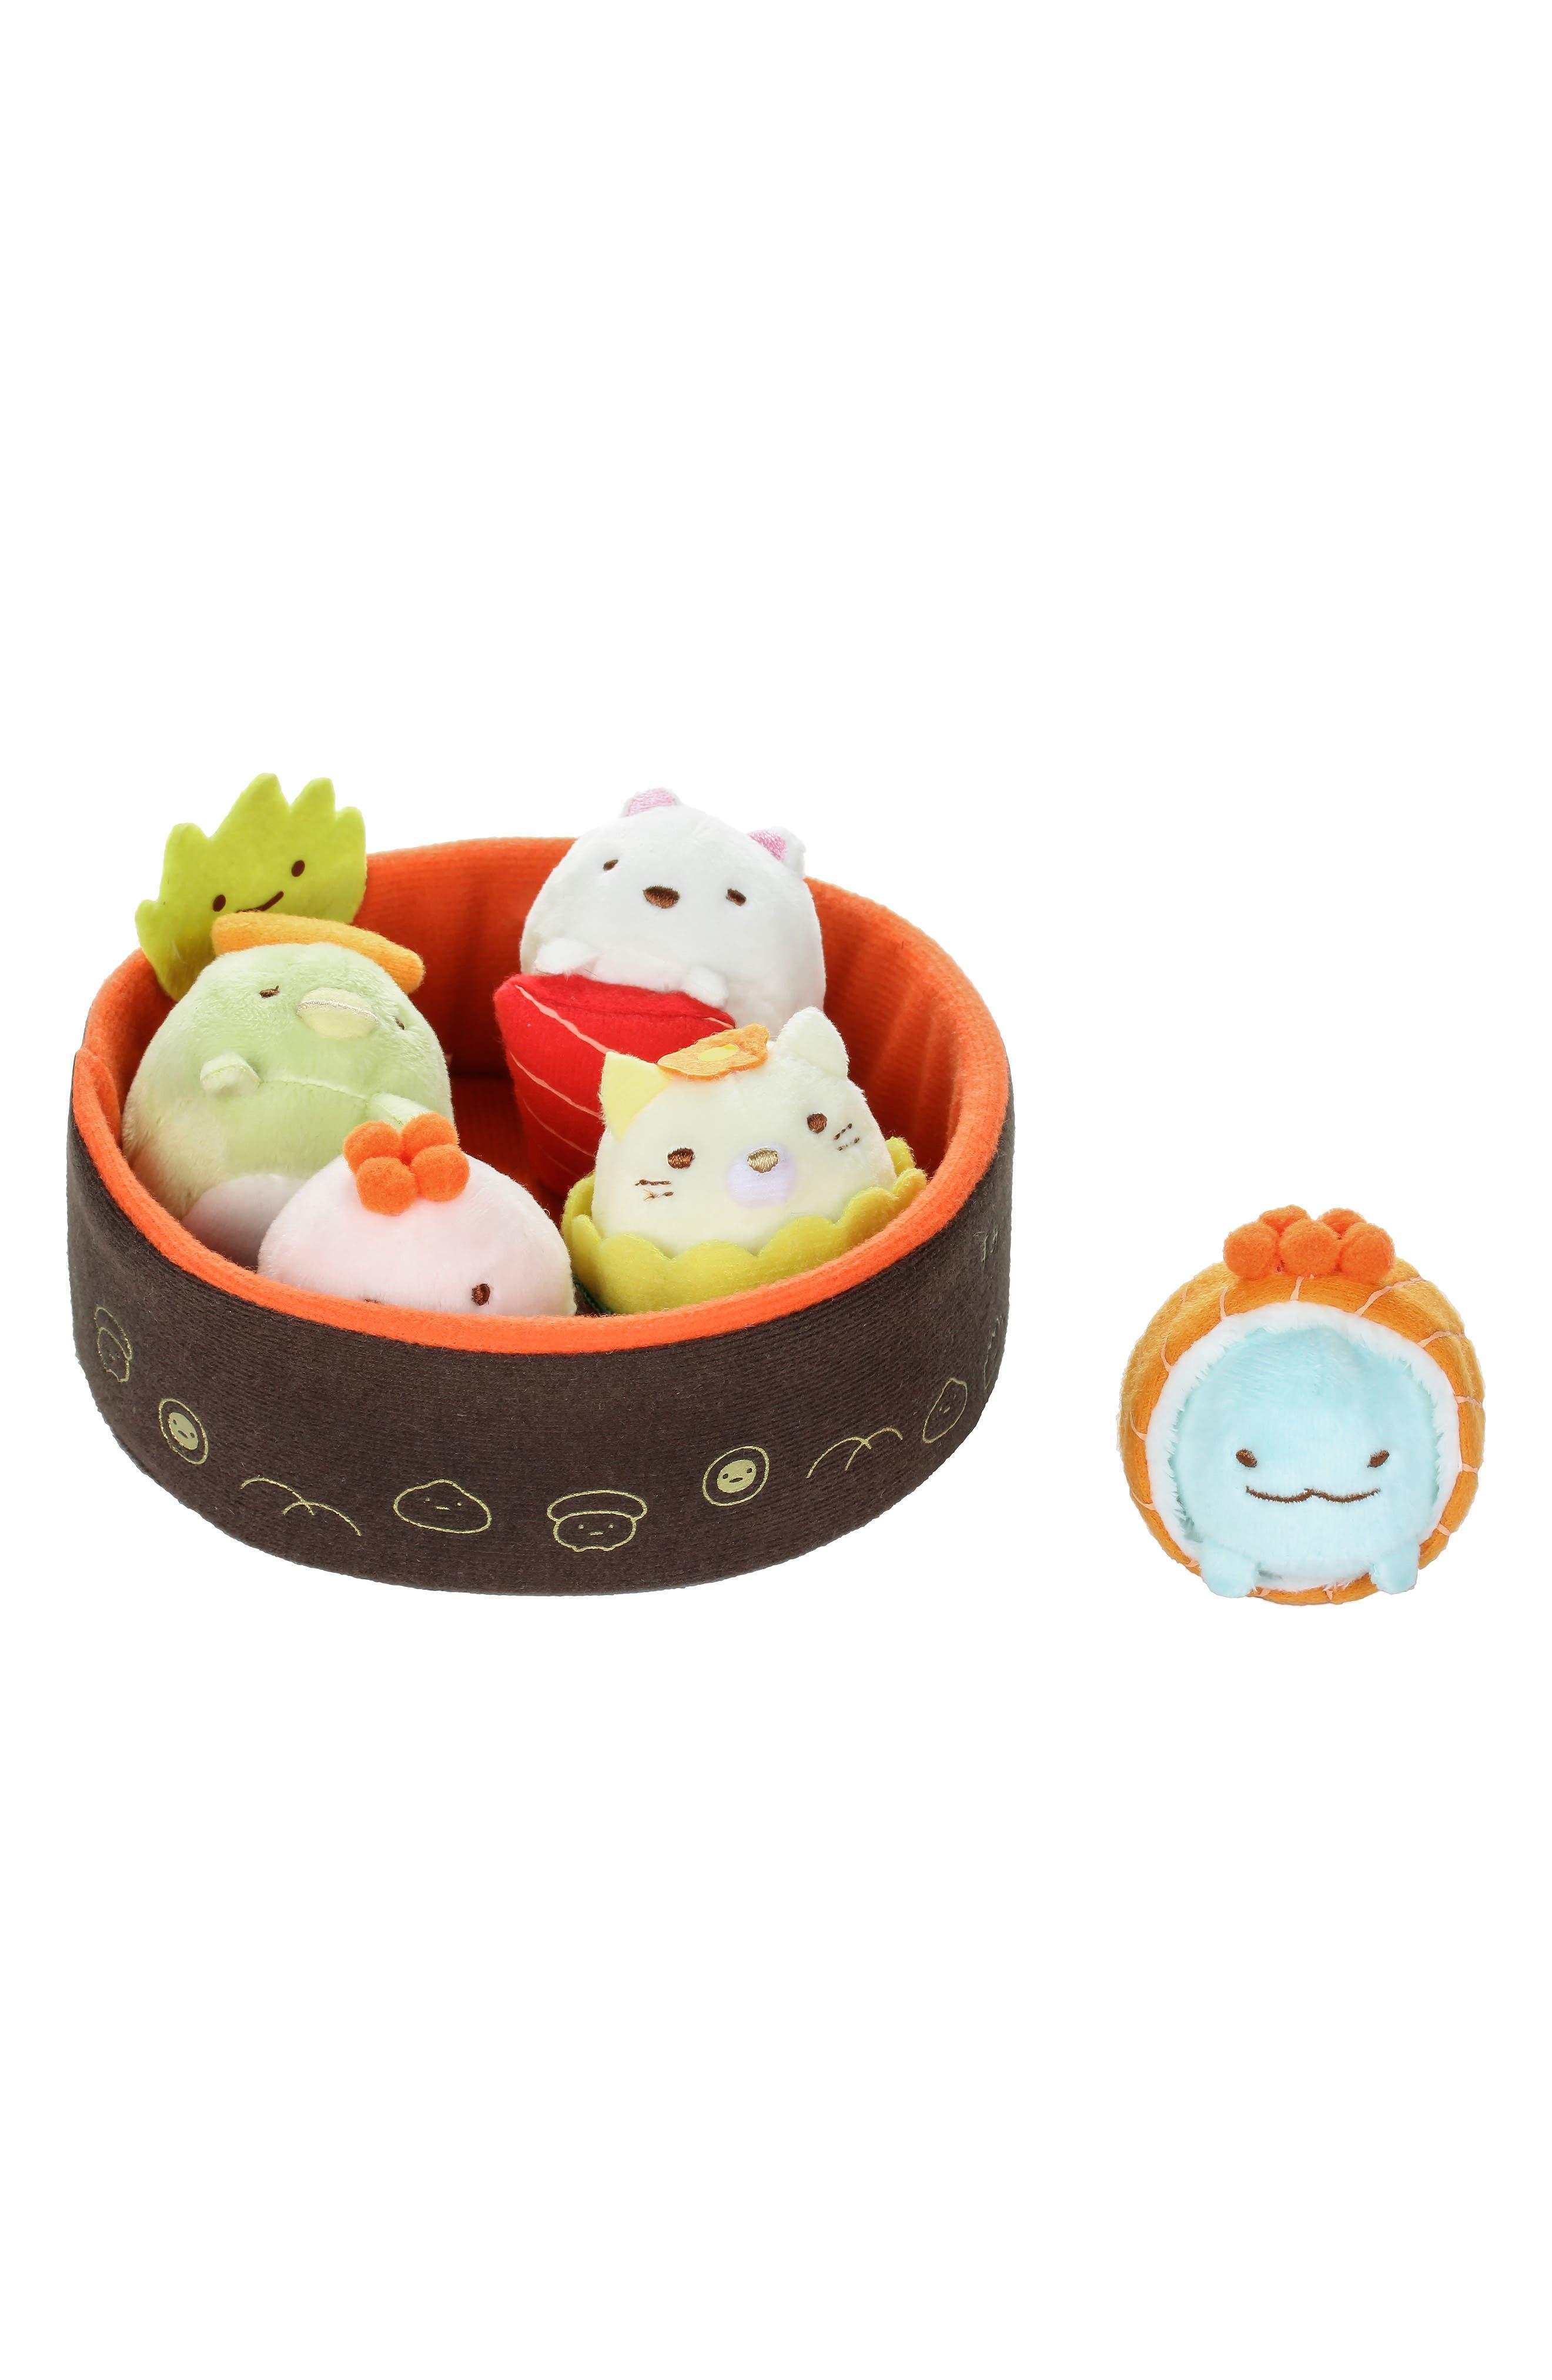 Rilakkuma Sumikko Gurashi Stuffed Sushi Bowl Set,                             Main thumbnail 1, color,                             300